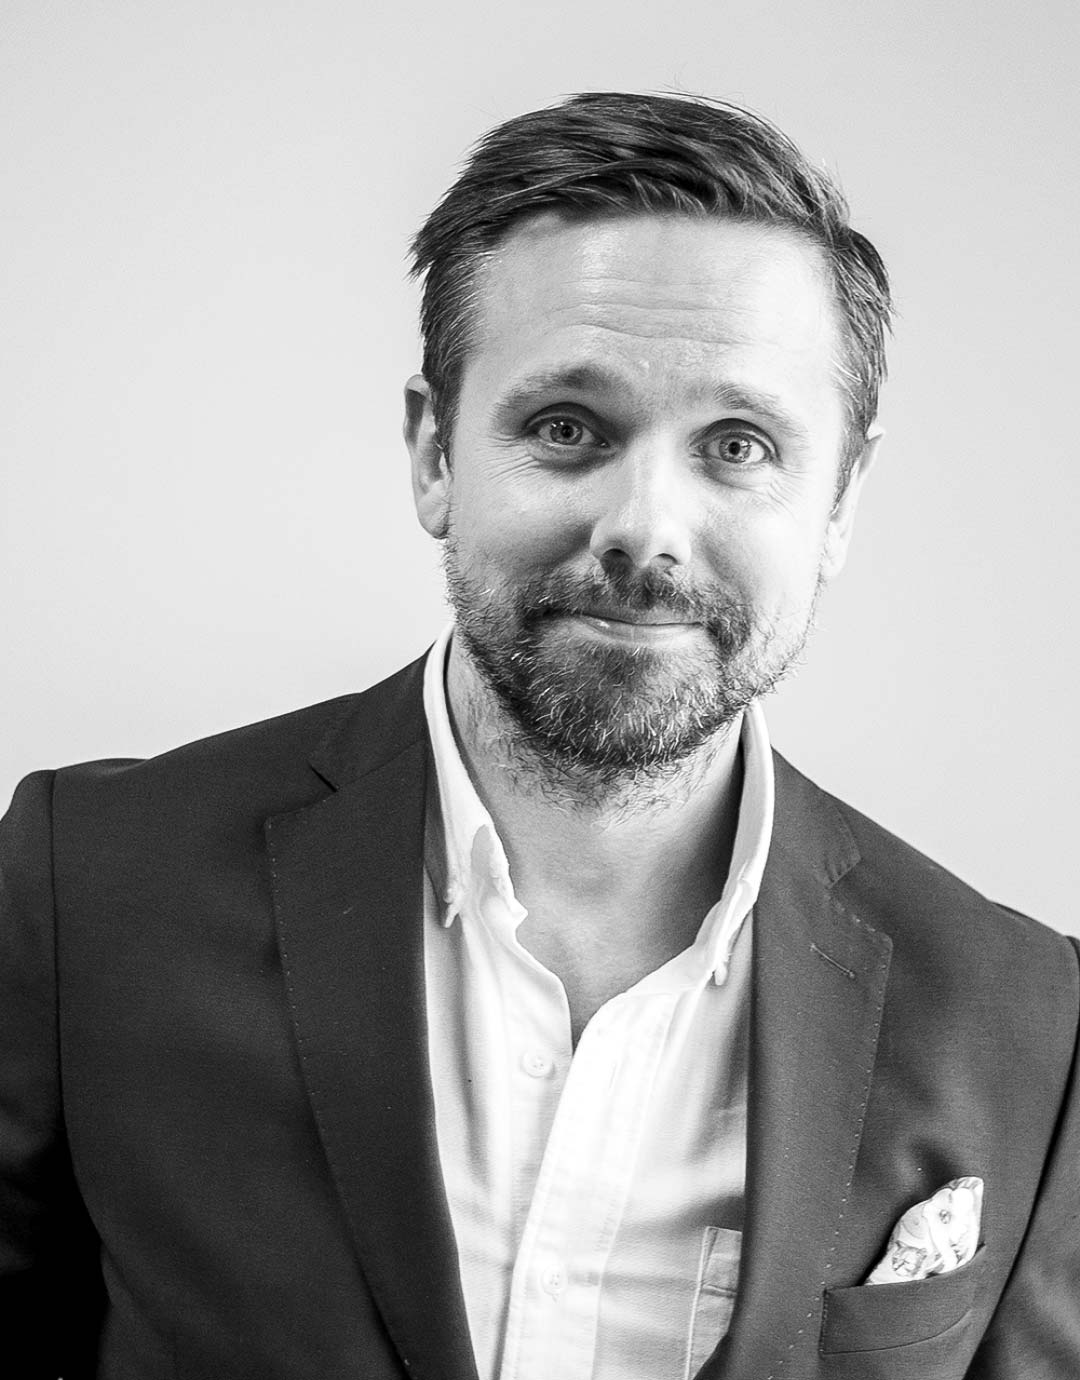 Marcus Sjölin